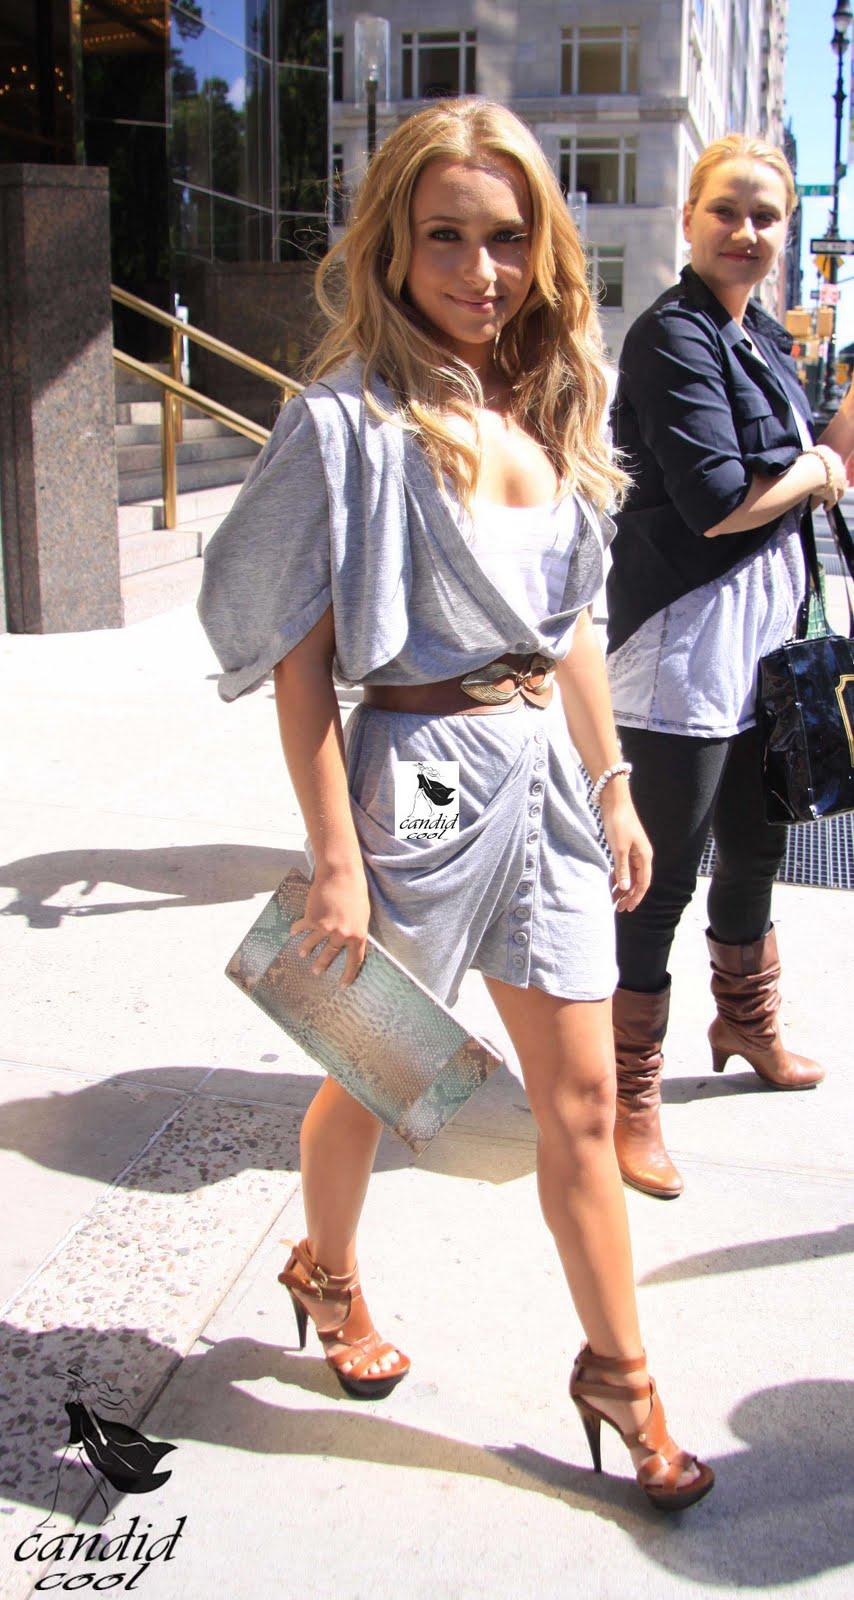 Candidcool Fashion Belt Accessories 2011